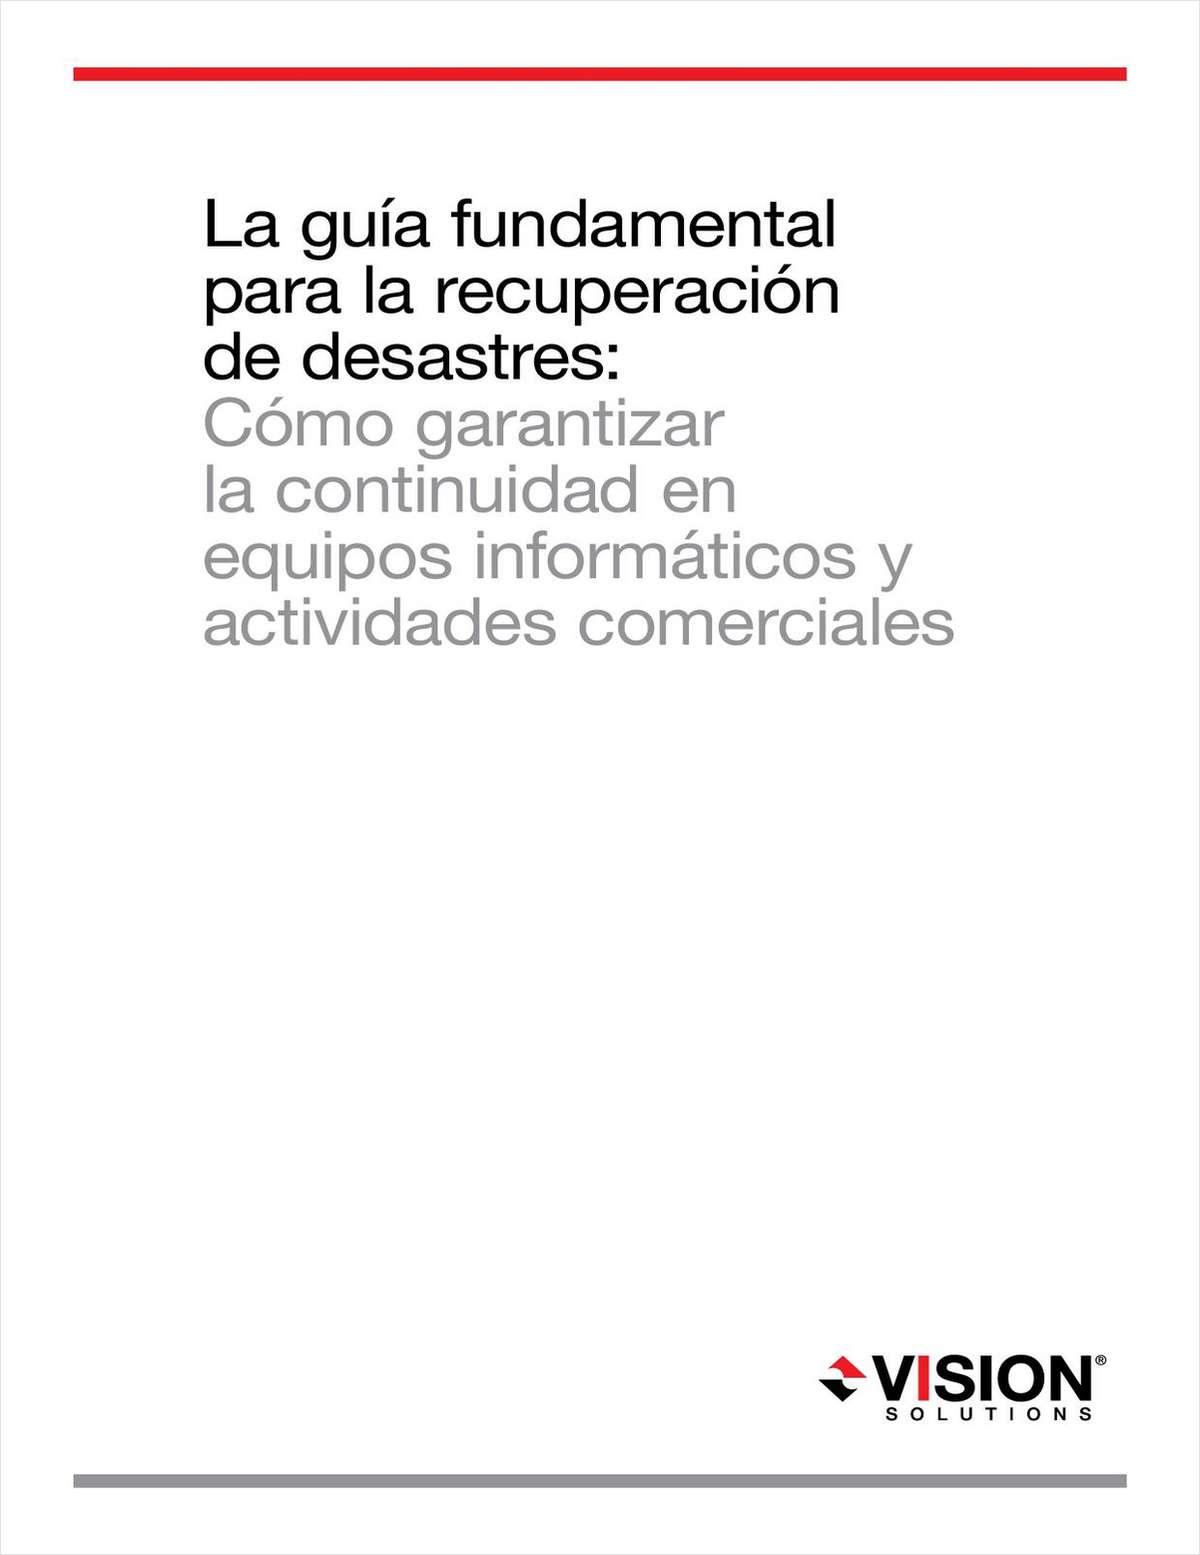 La Guia Esencial para AIX y IBM i(i5/OS) de Recuperacion de Desastres